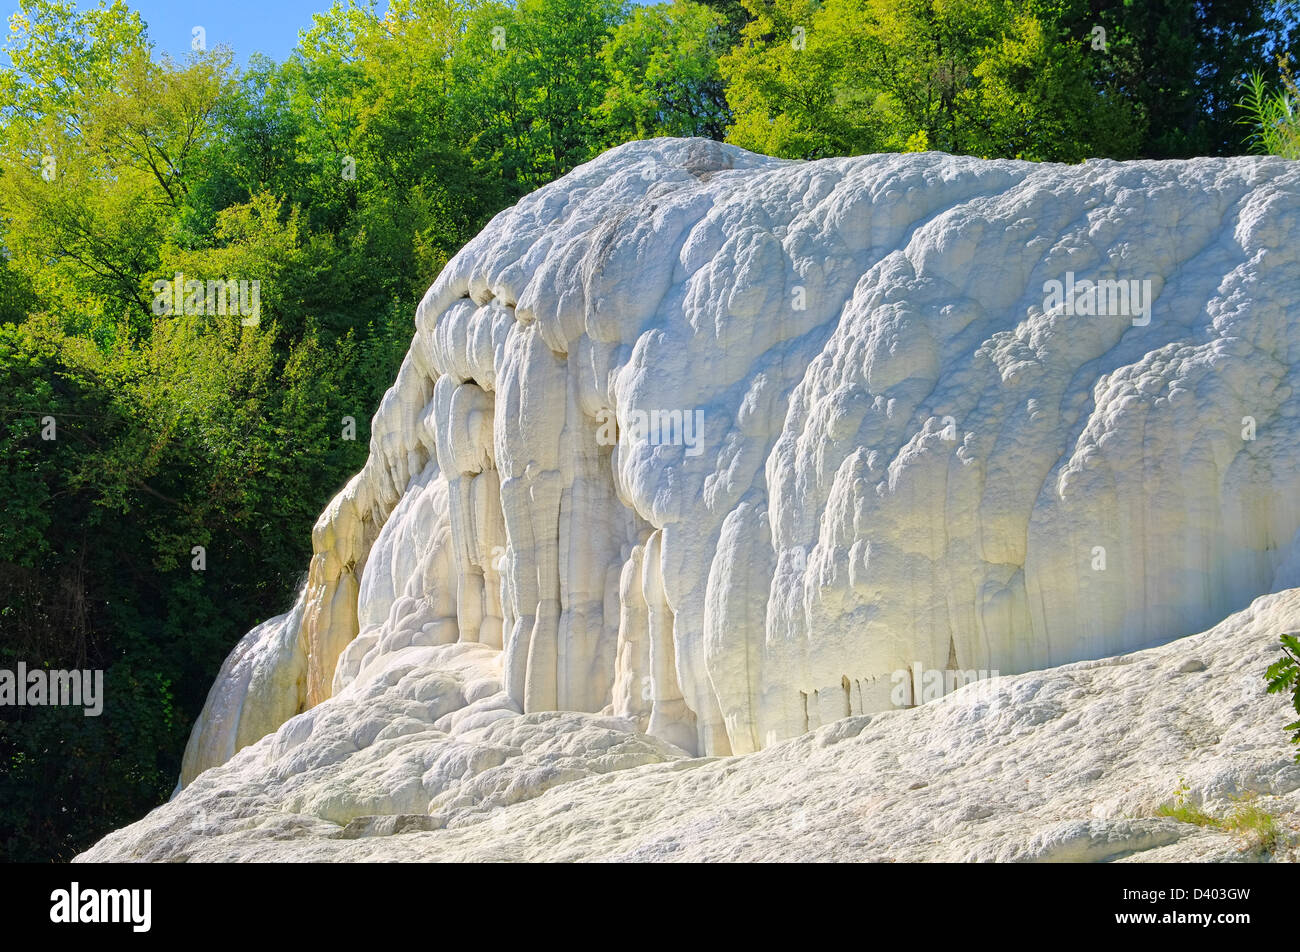 Bagni San Filippo Fosso Bianco 04 Stock Photo: 54092553 - Alamy